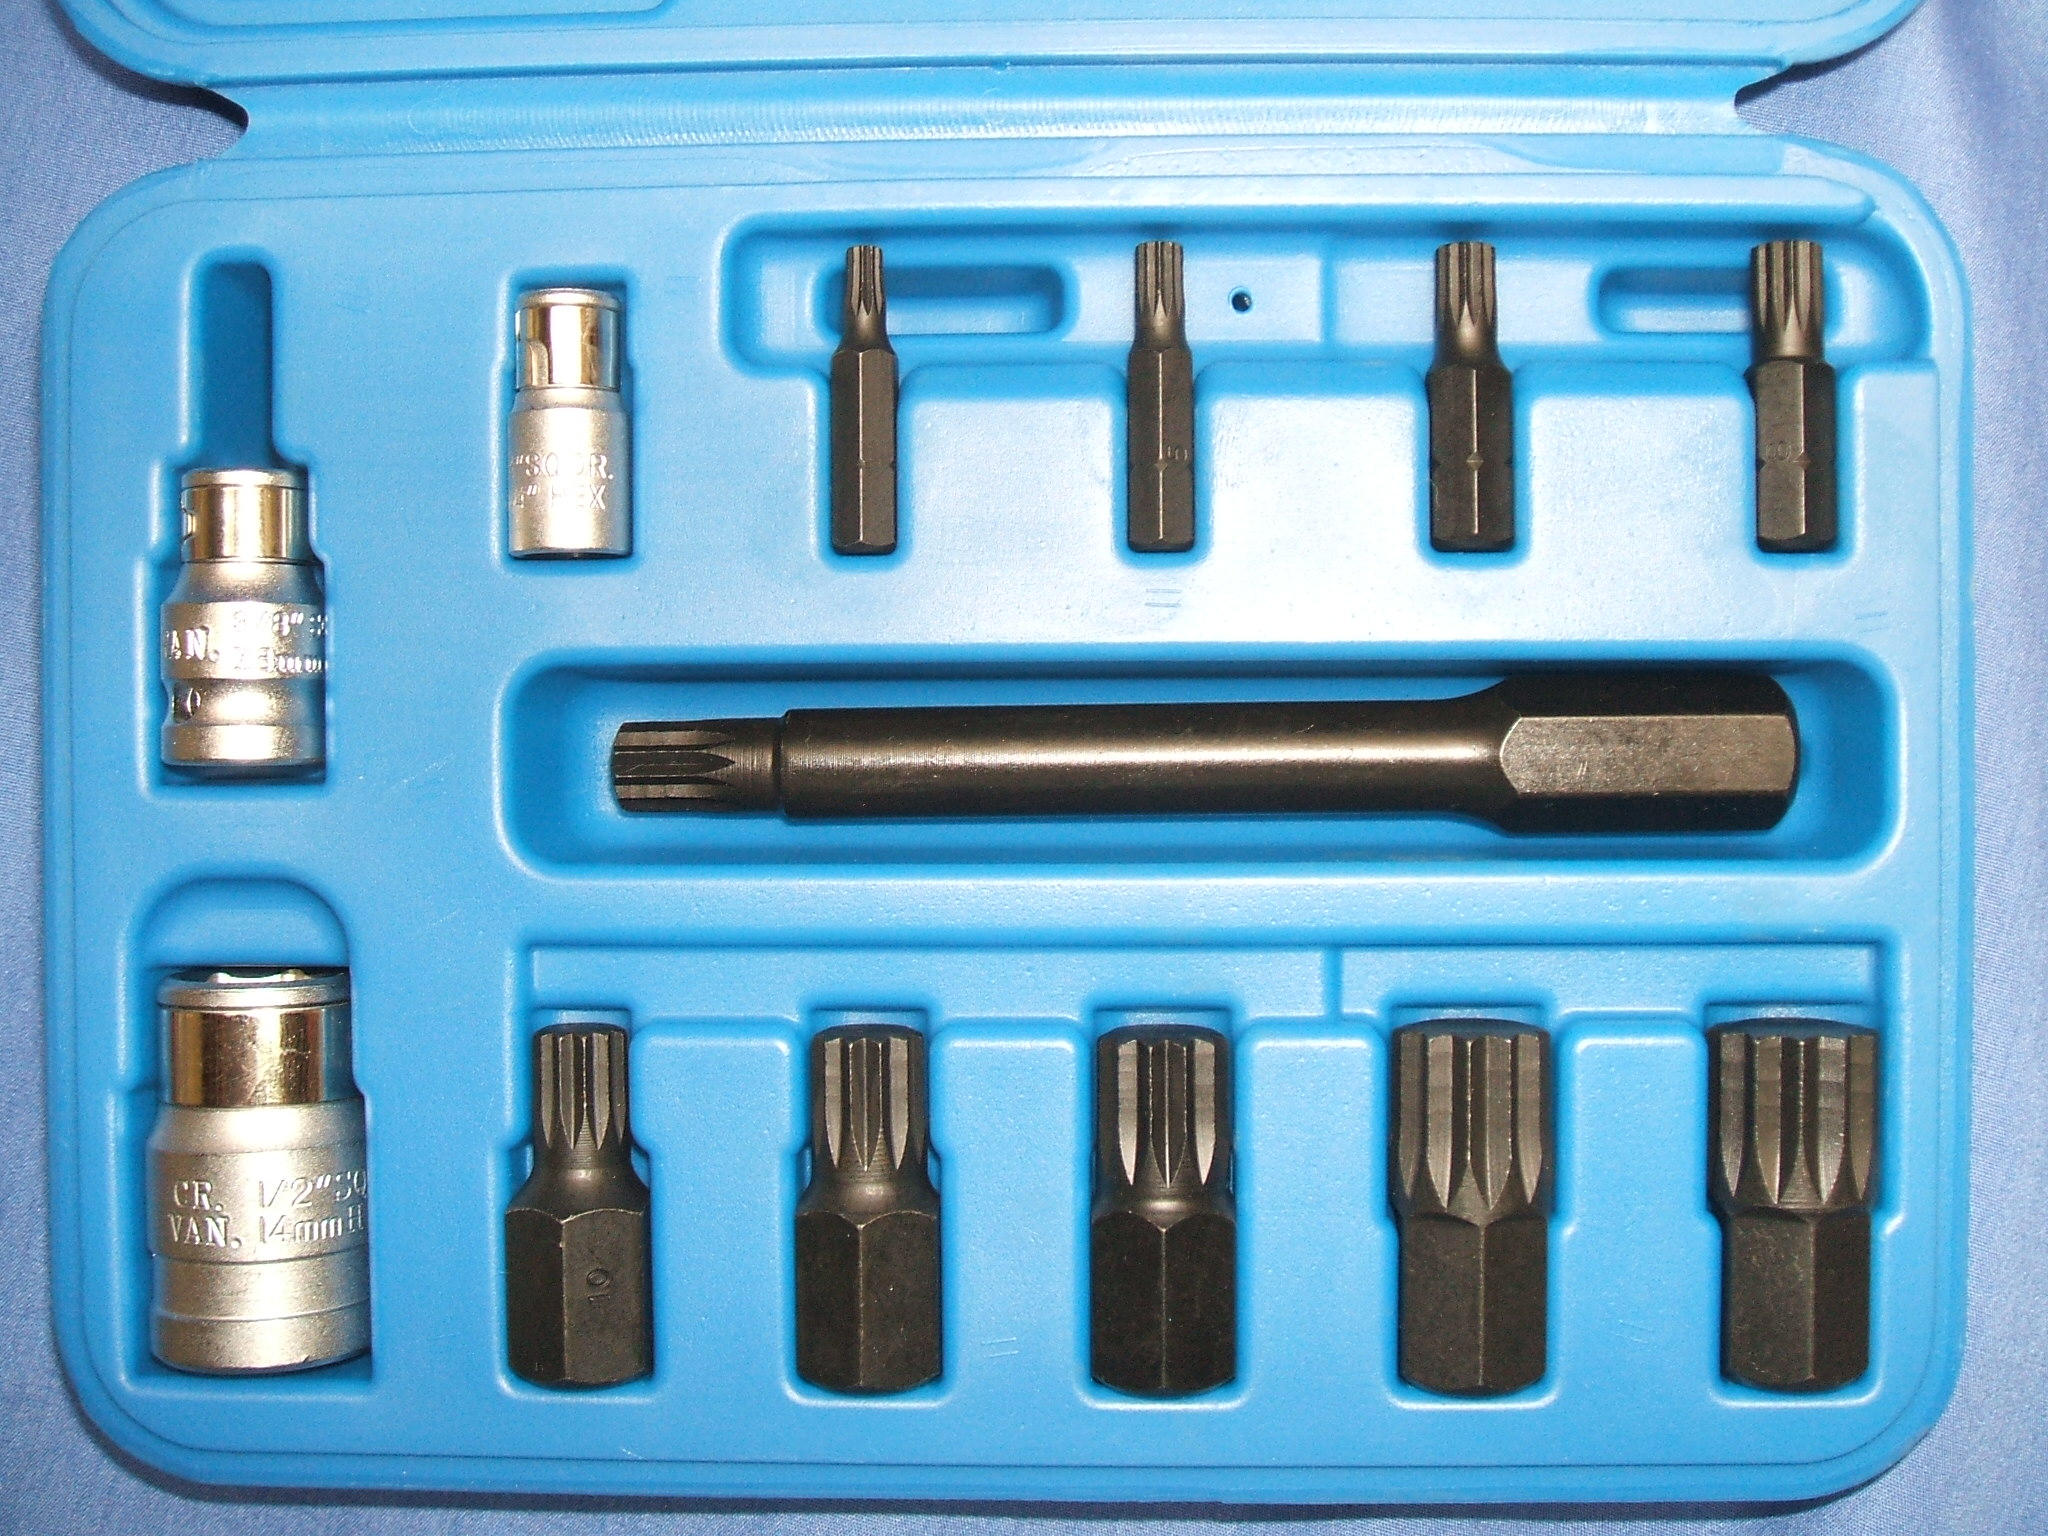 Vw 174 Audi 174 Tools Sockets Drivers And Bits Kit1 Part